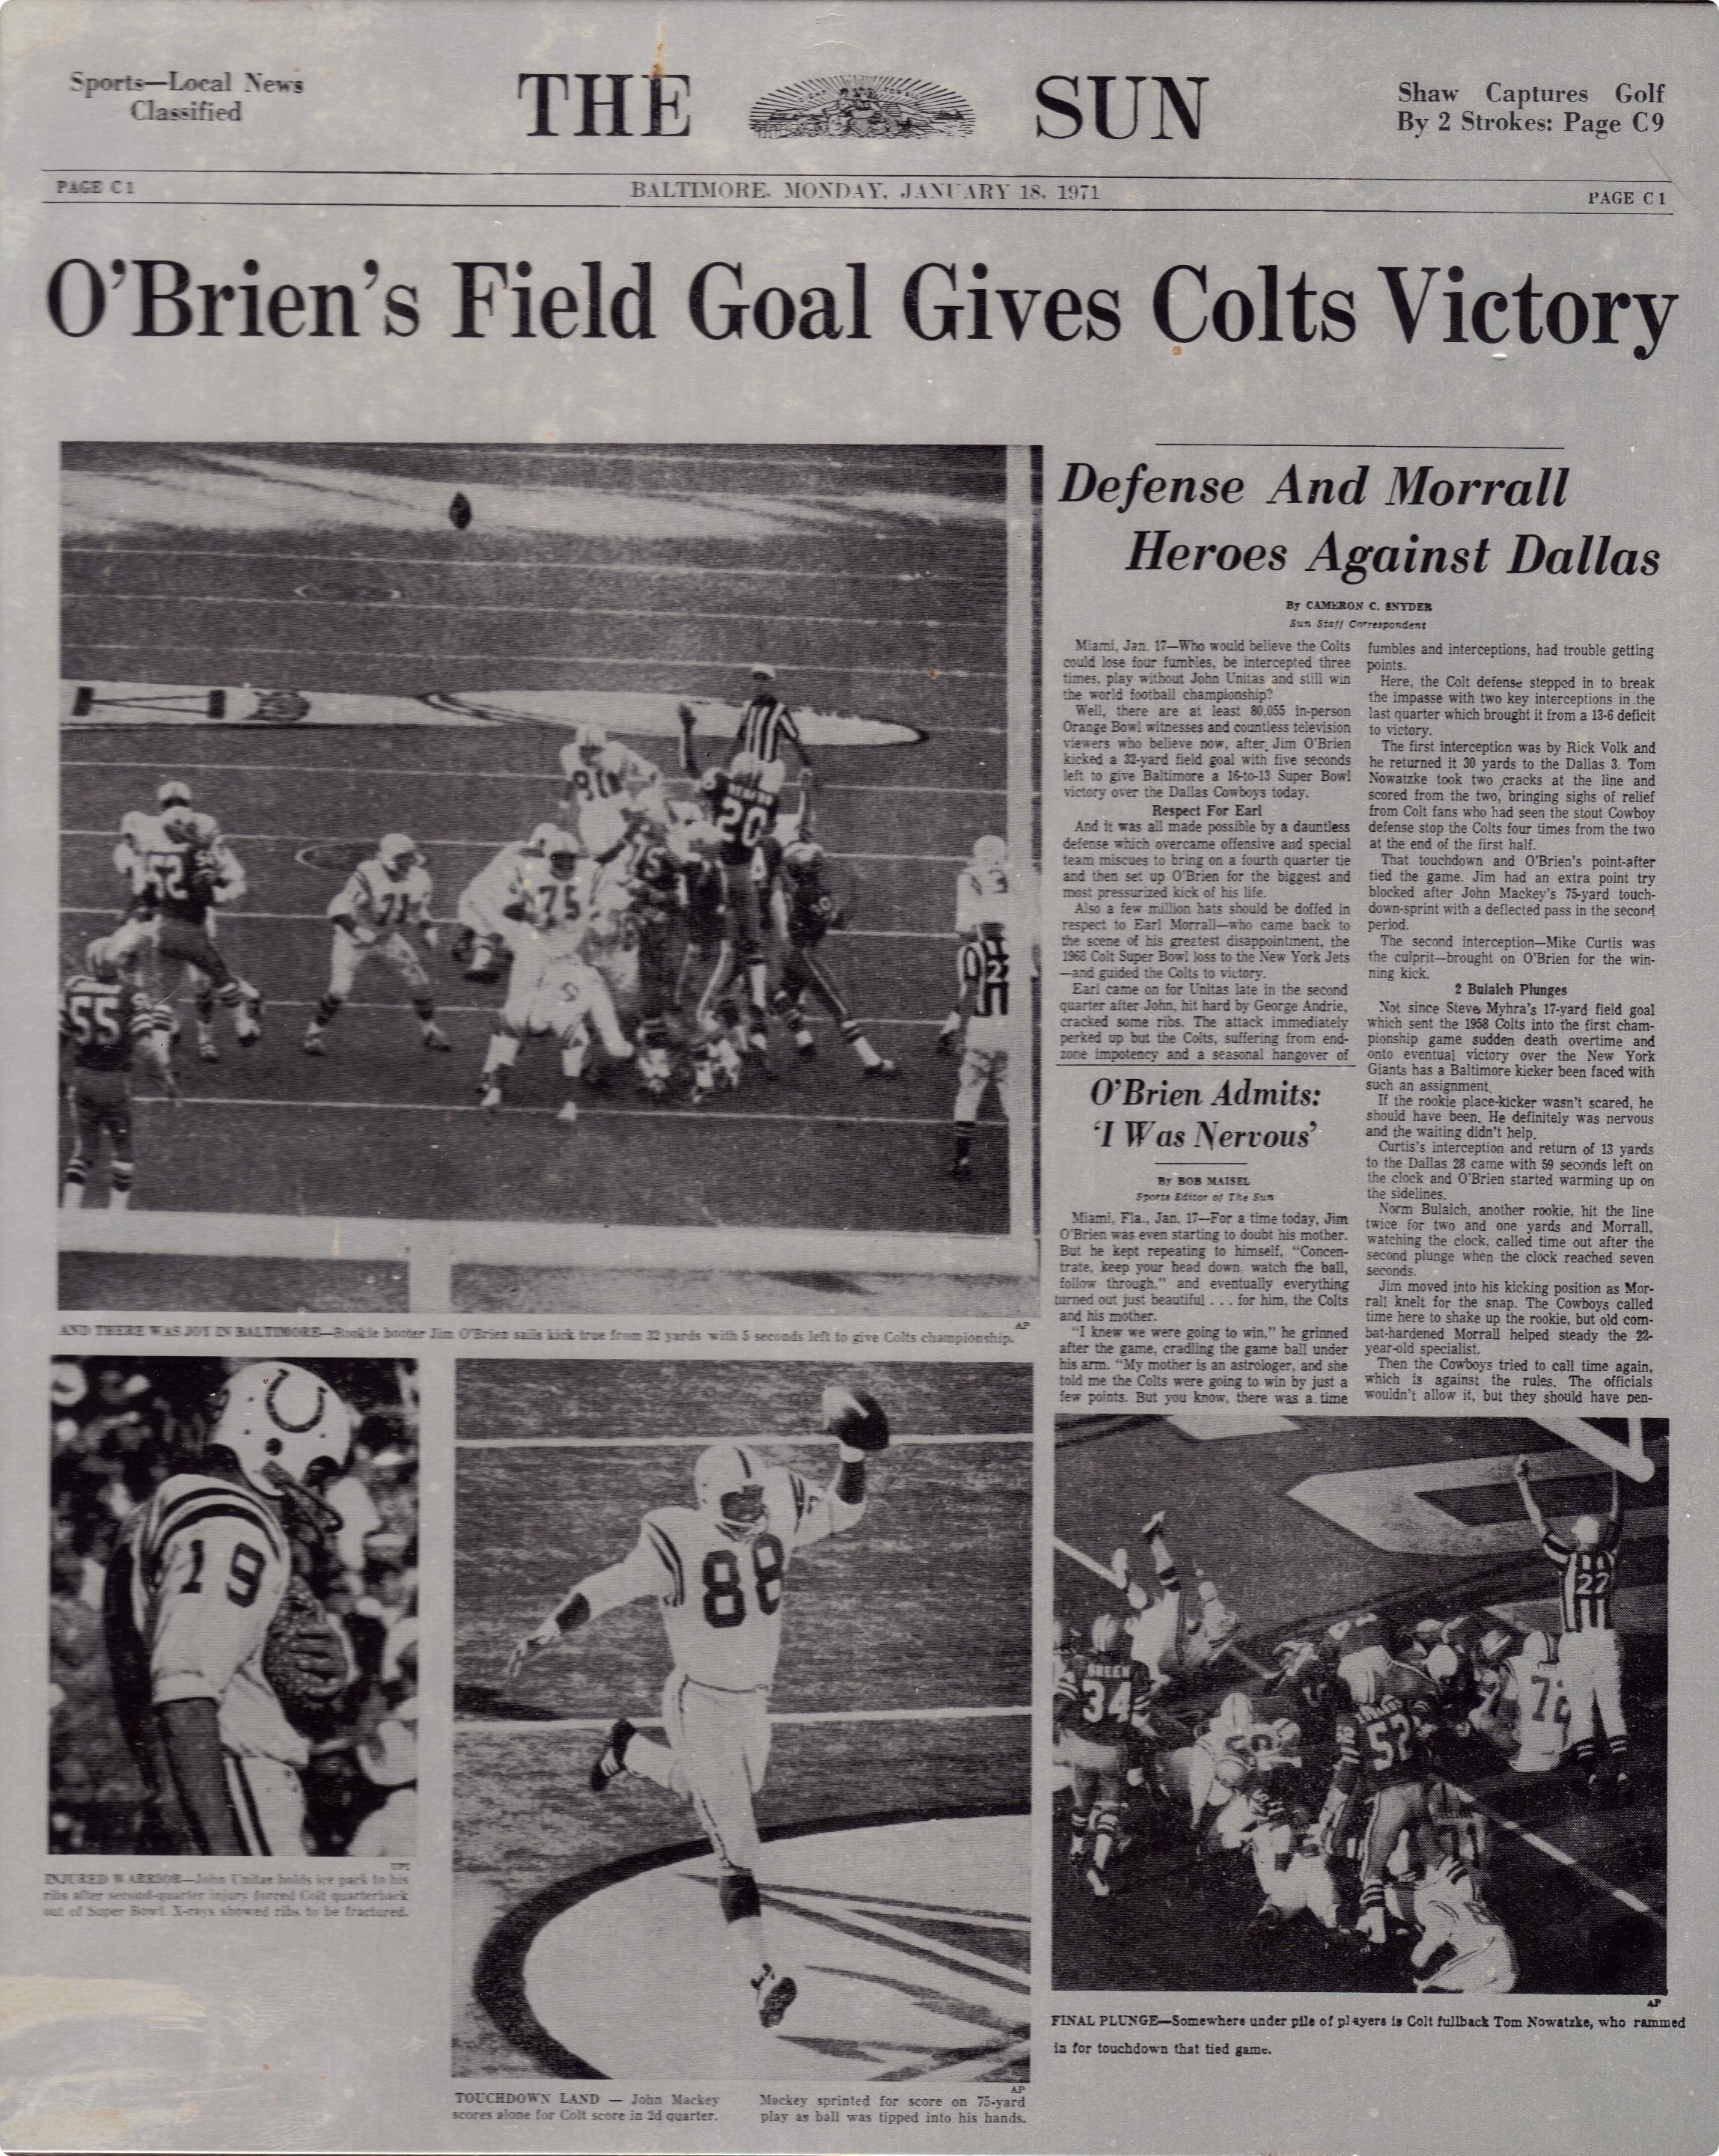 super-bowl-v-front-page - Dallas Cowboys vs. Baltimore Colts - Dallas Cowboys history